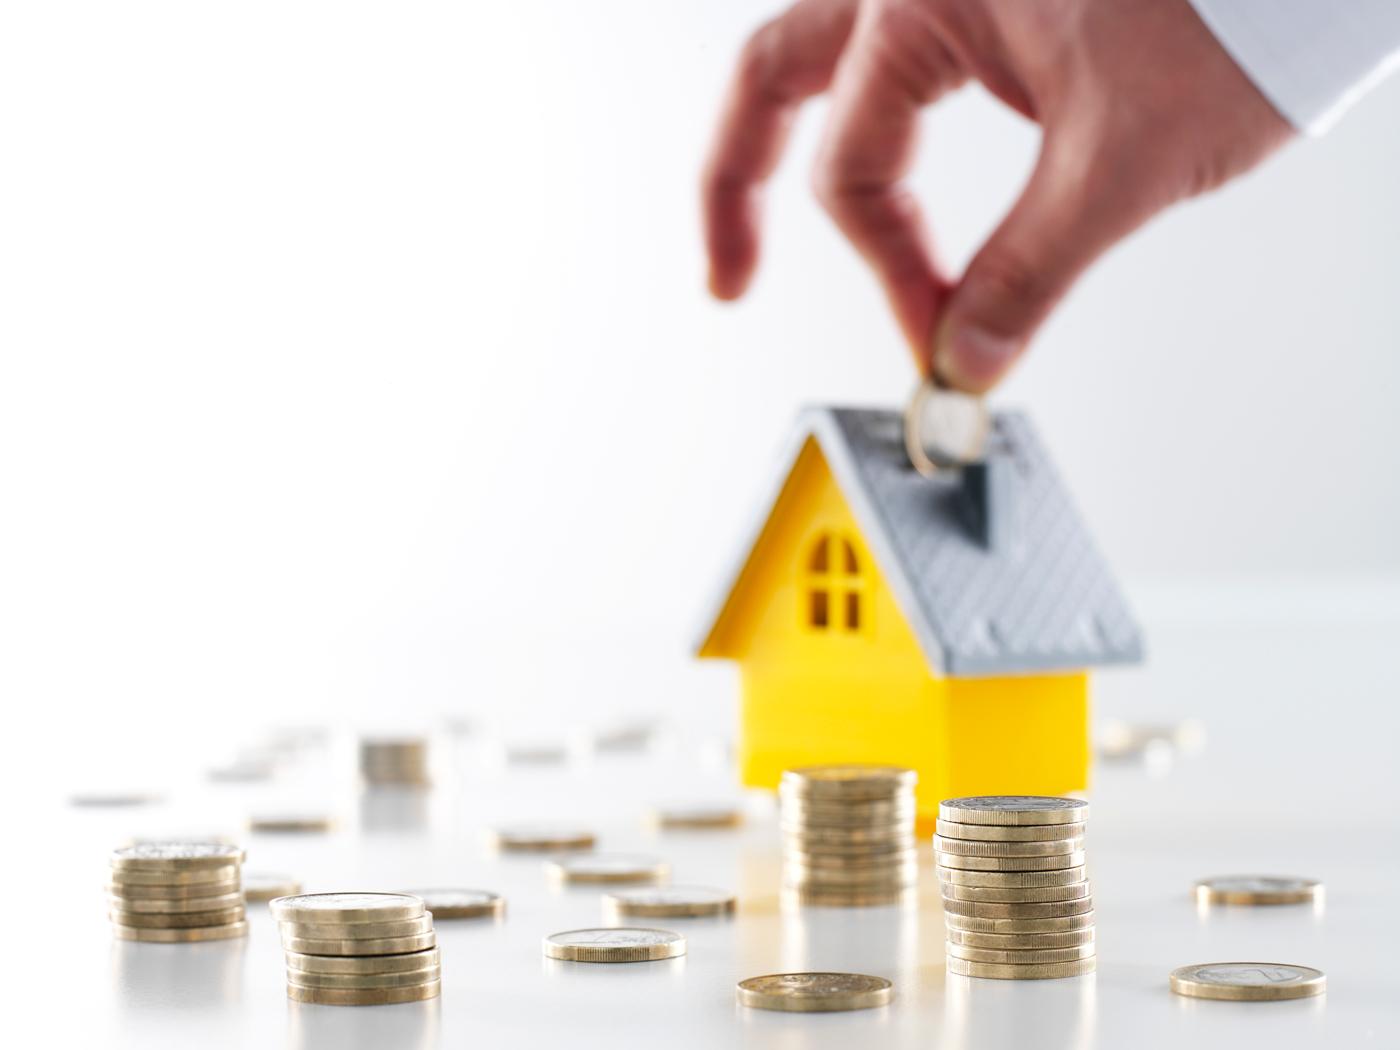 Cimb Bank Personal Loan